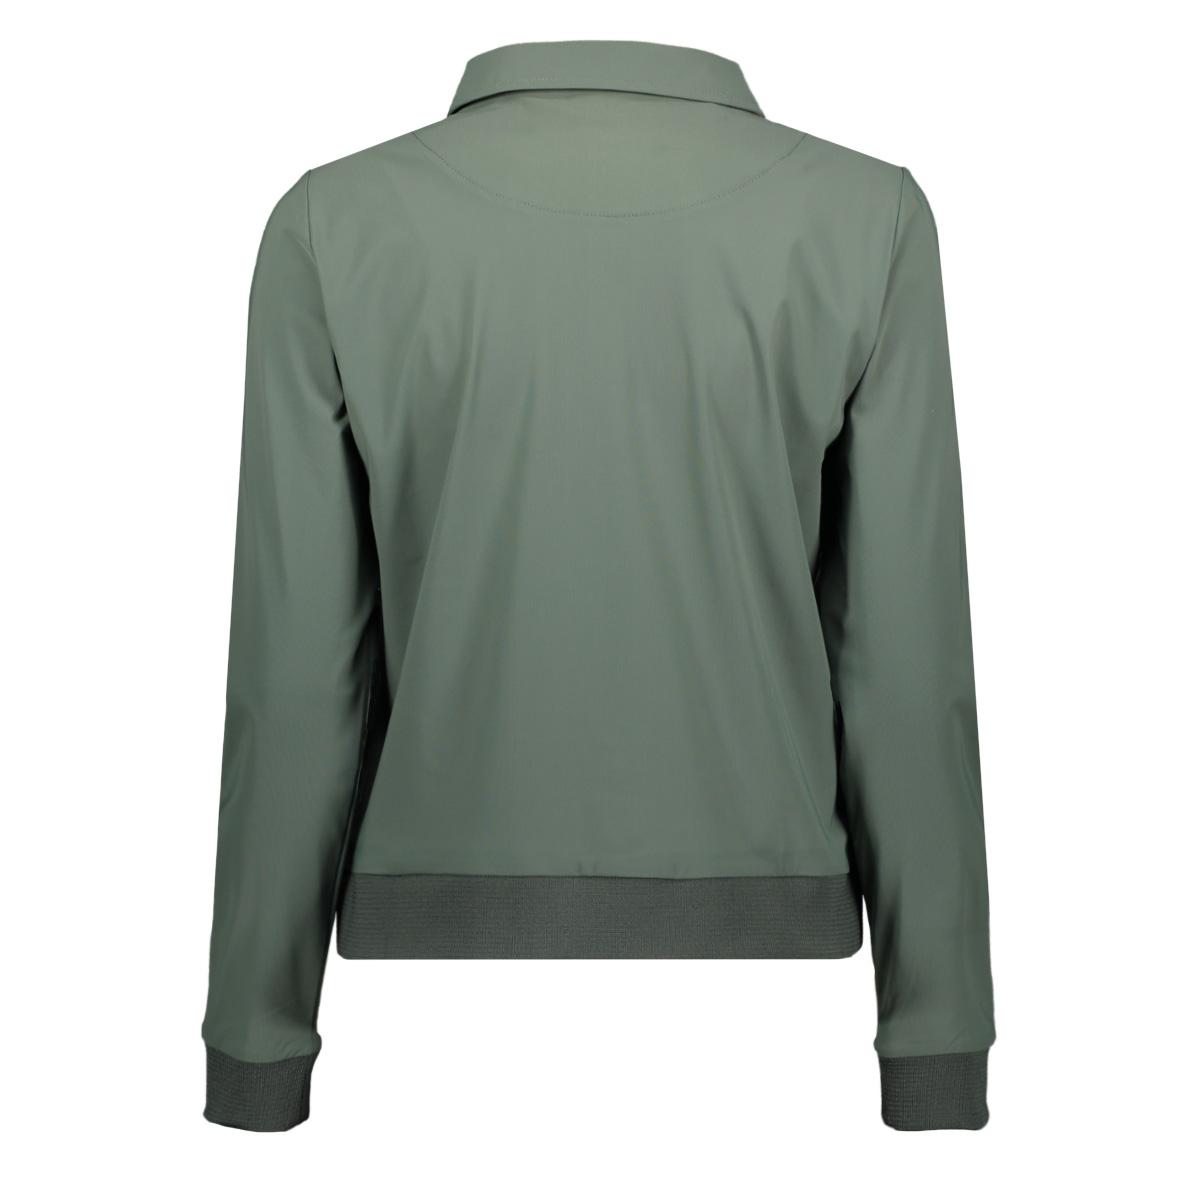 bianca travel jacket 202 zoso jas greenstone